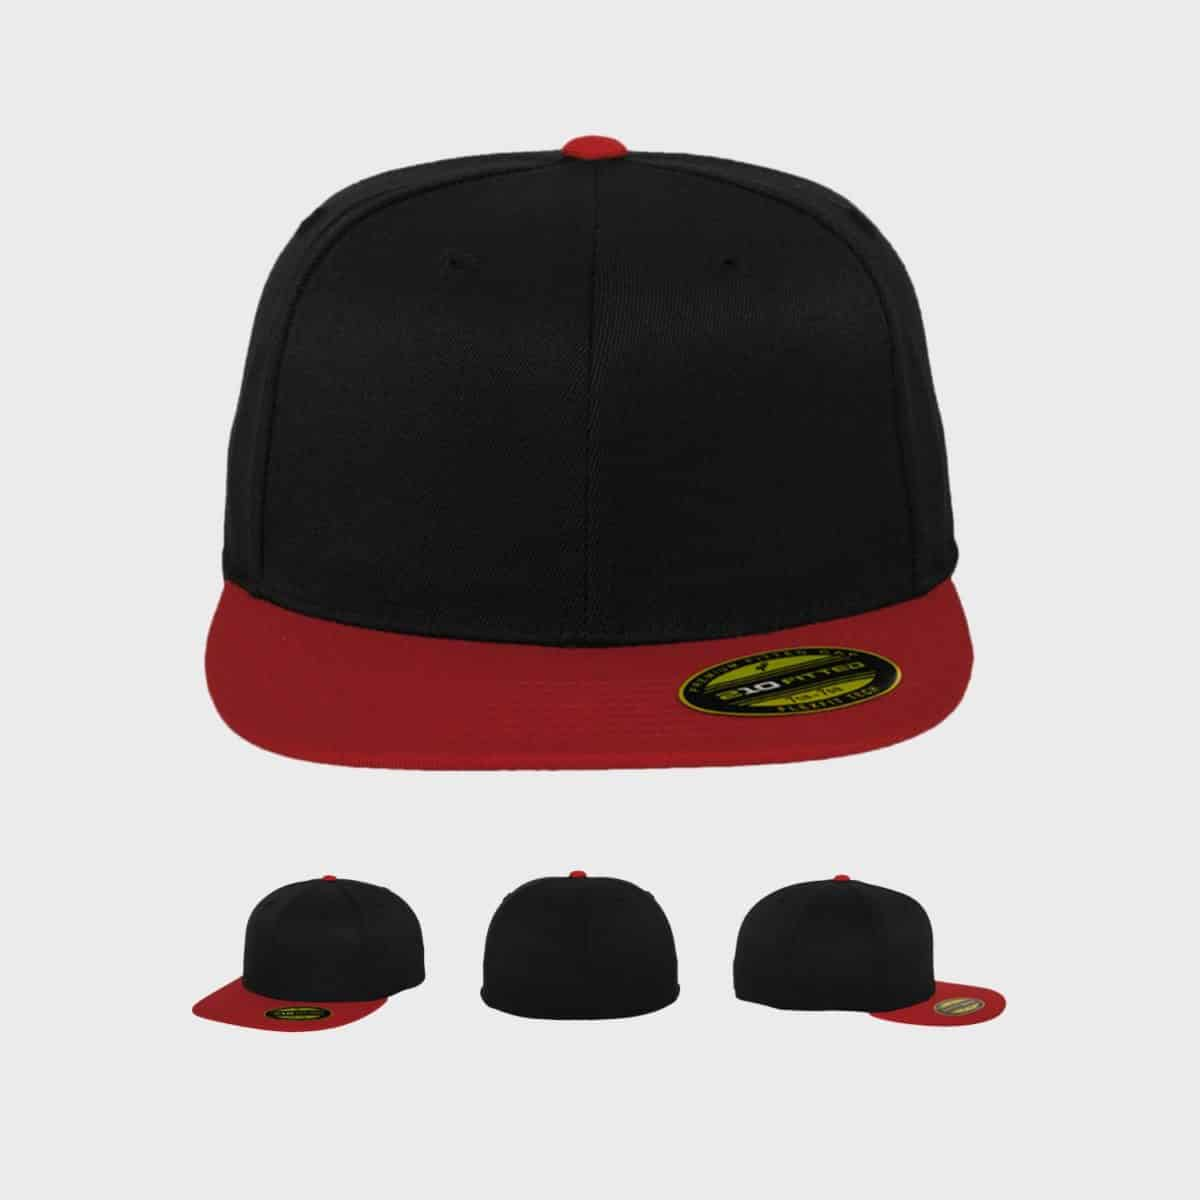 Flexfit FlexfitCaps Black Red Front Extra